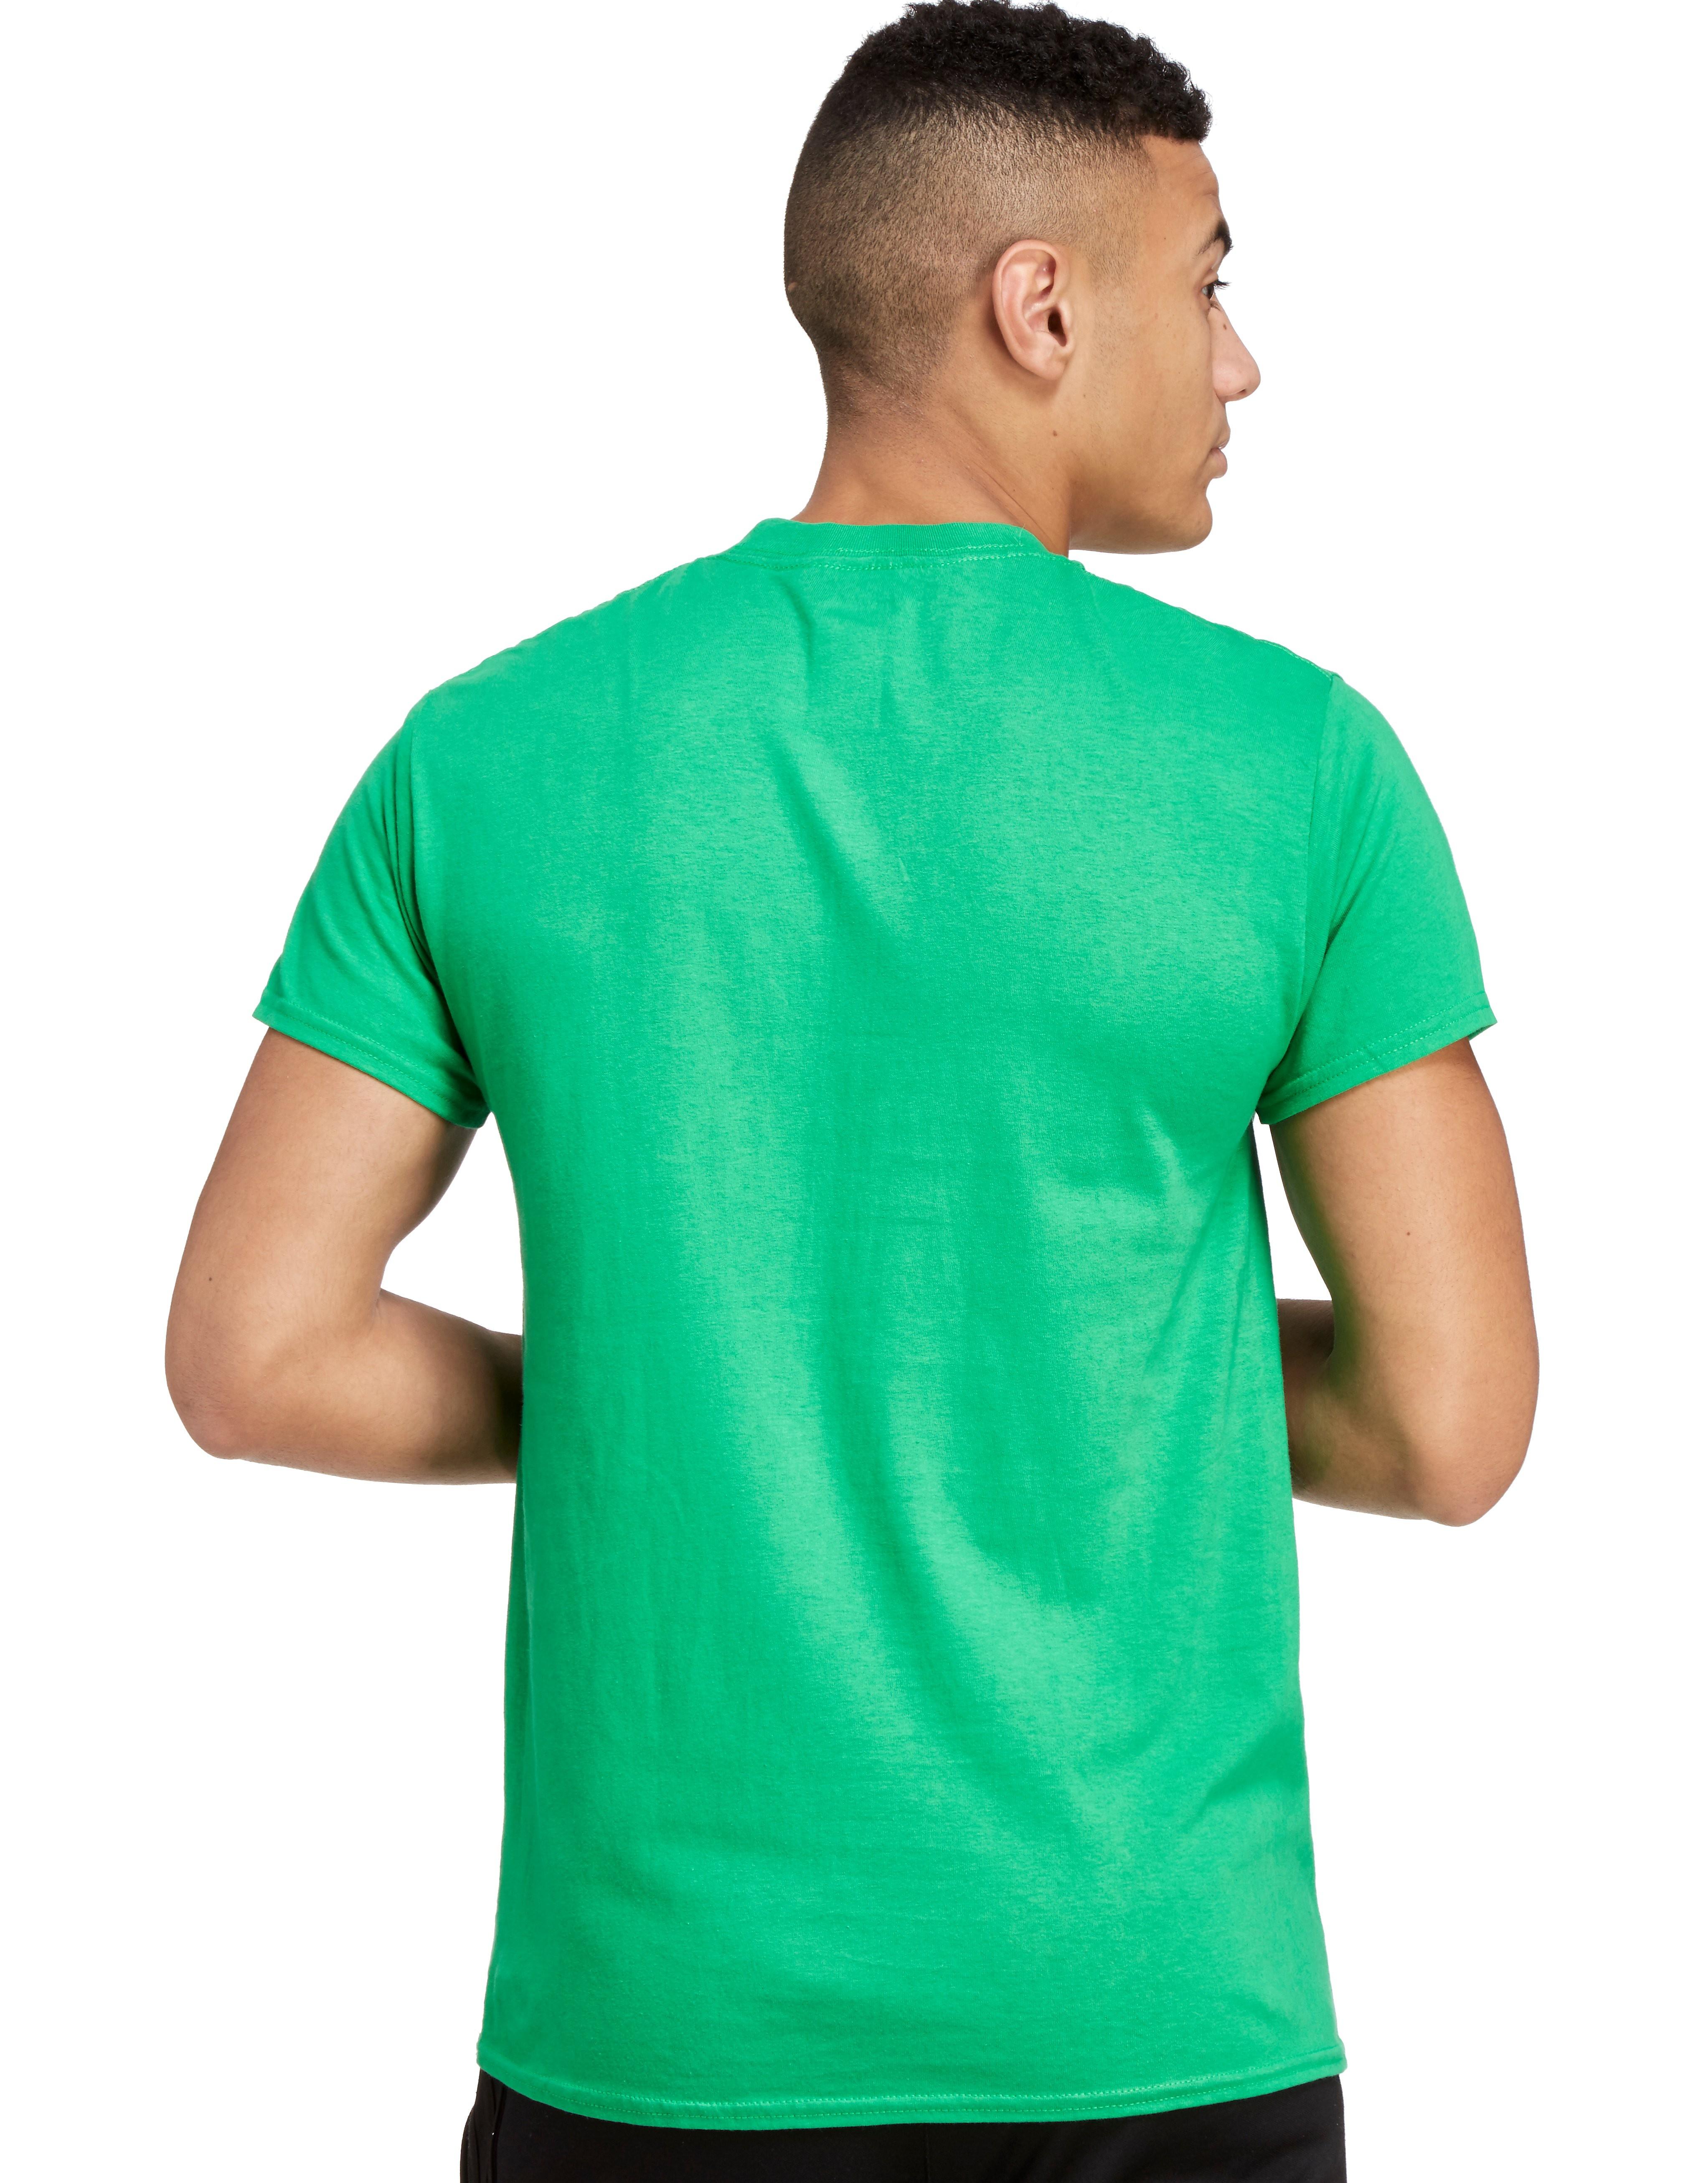 Official Team T-shirt con stemma dell'Irlanda del Nord